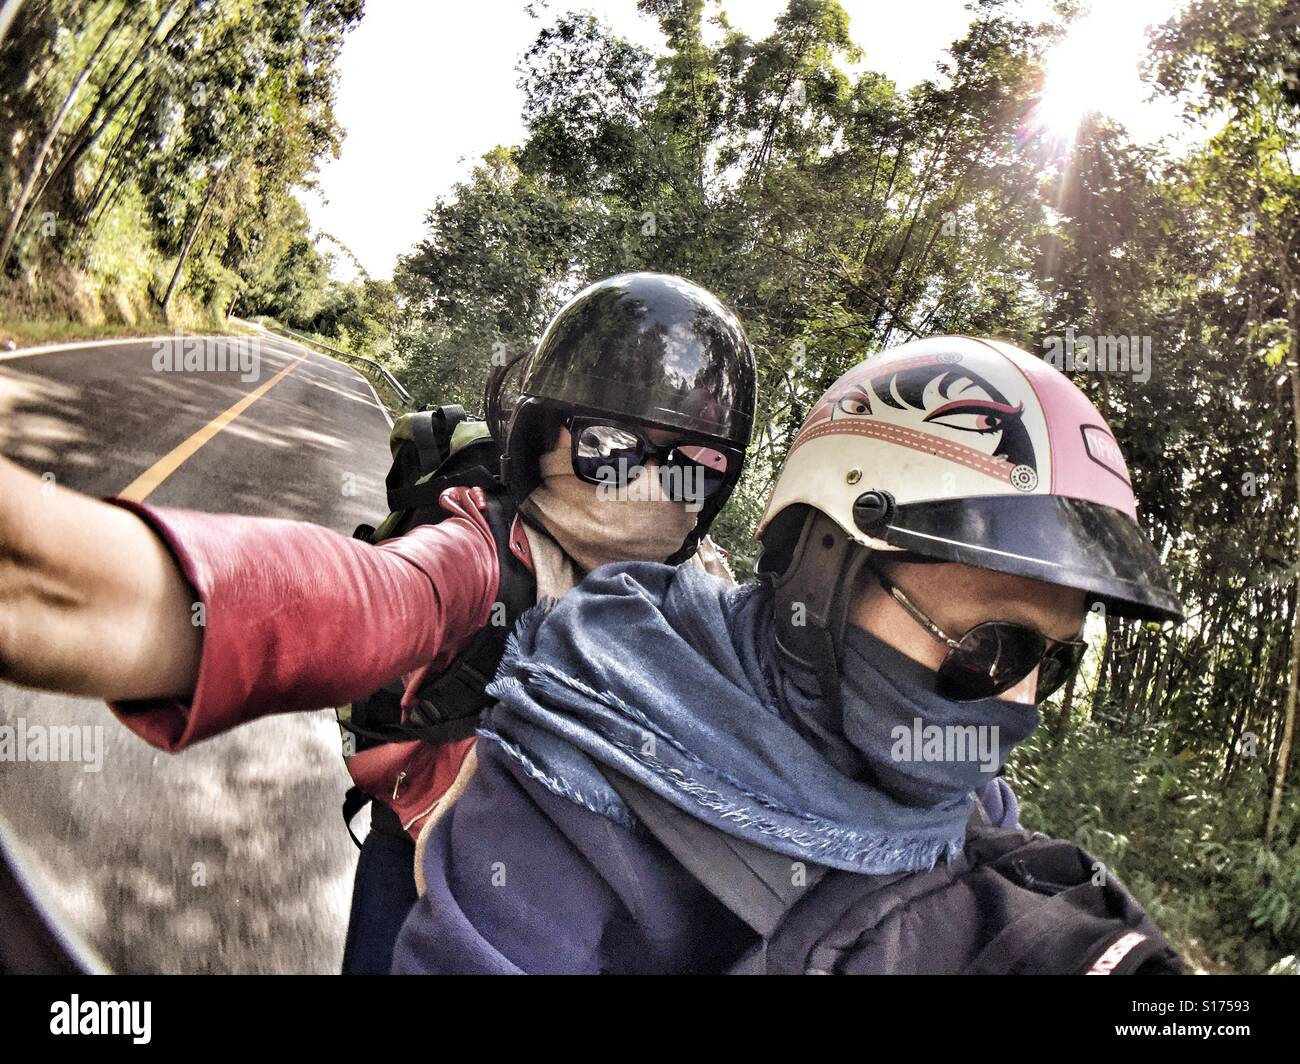 Traveller selfie on motorcycle Stock Photo